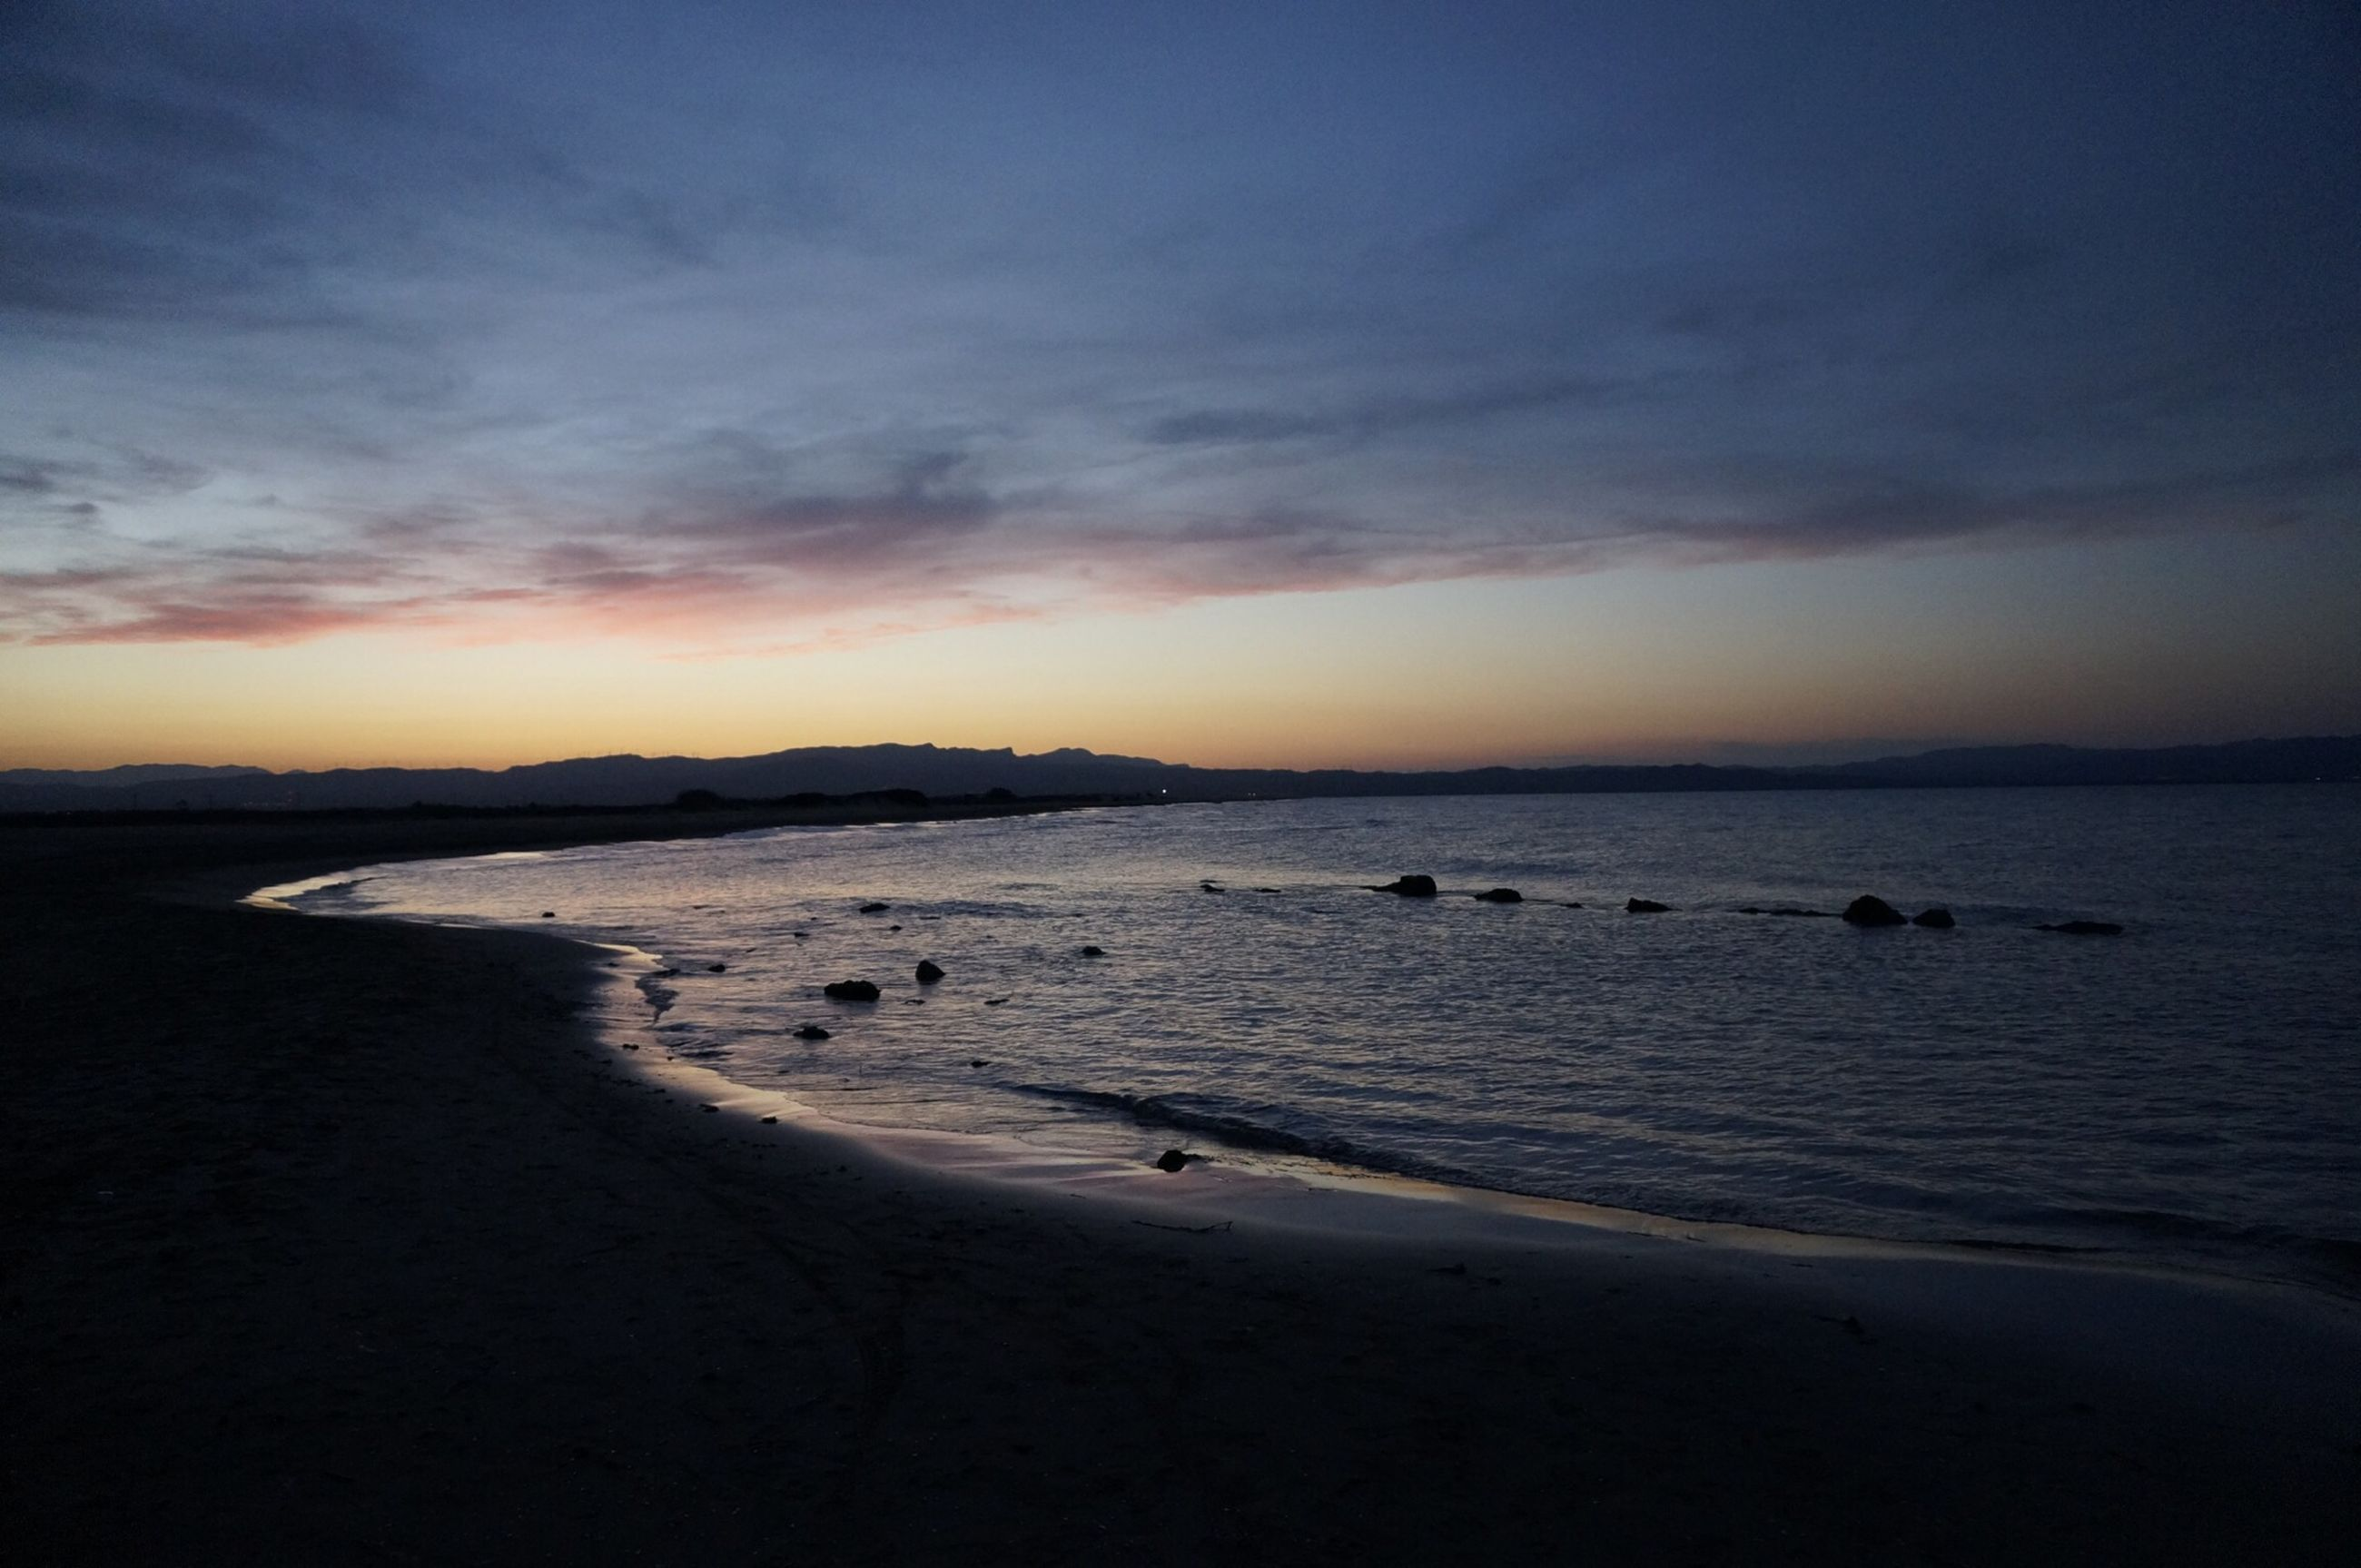 sea, beach, water, sunset, shore, tranquil scene, scenics, sky, beauty in nature, tranquility, sand, horizon over water, nature, coastline, cloud - sky, idyllic, dusk, silhouette, wave, cloud